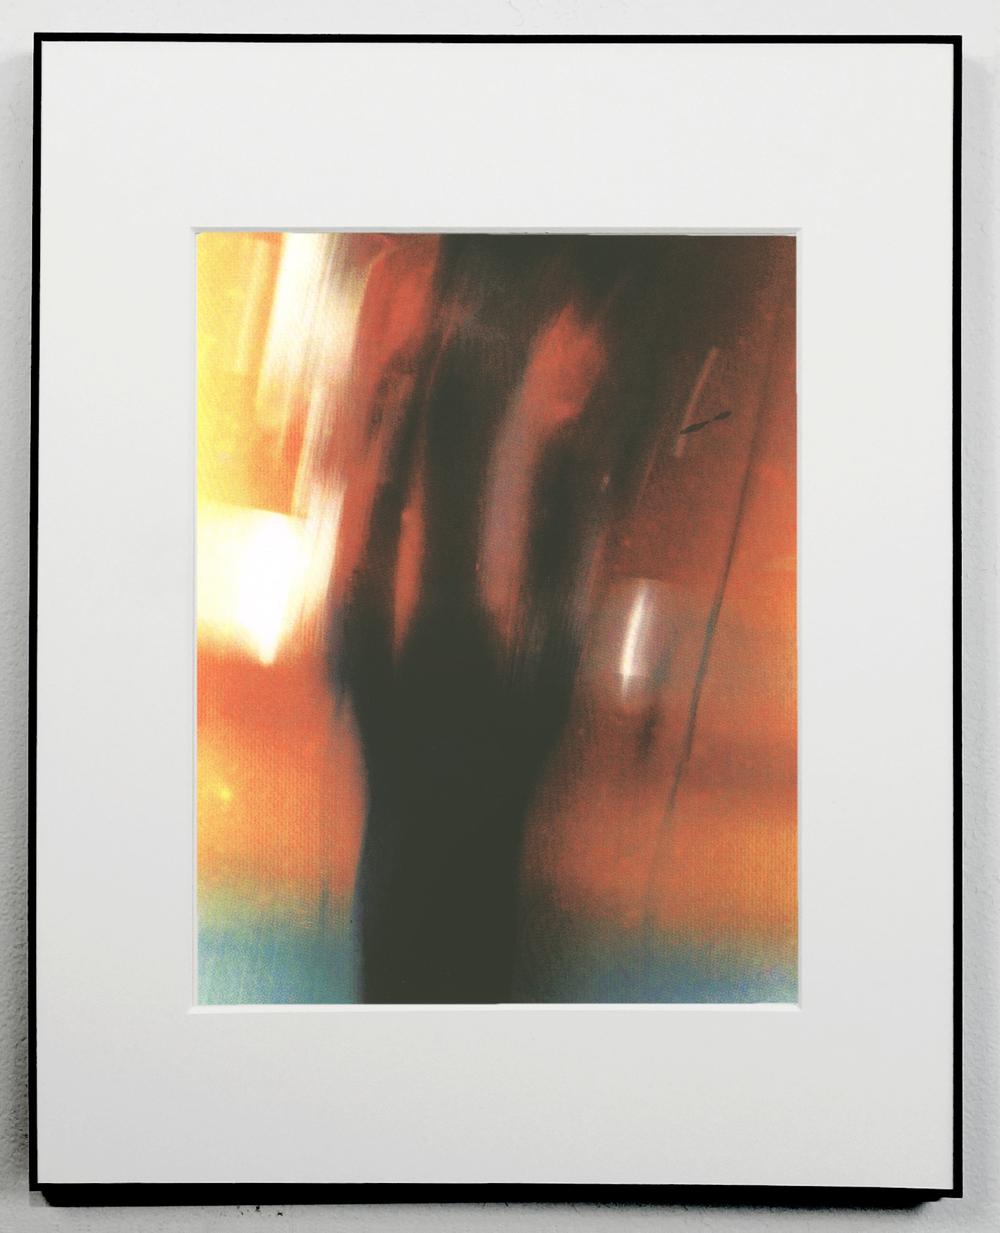 blur_frame_1.jpg